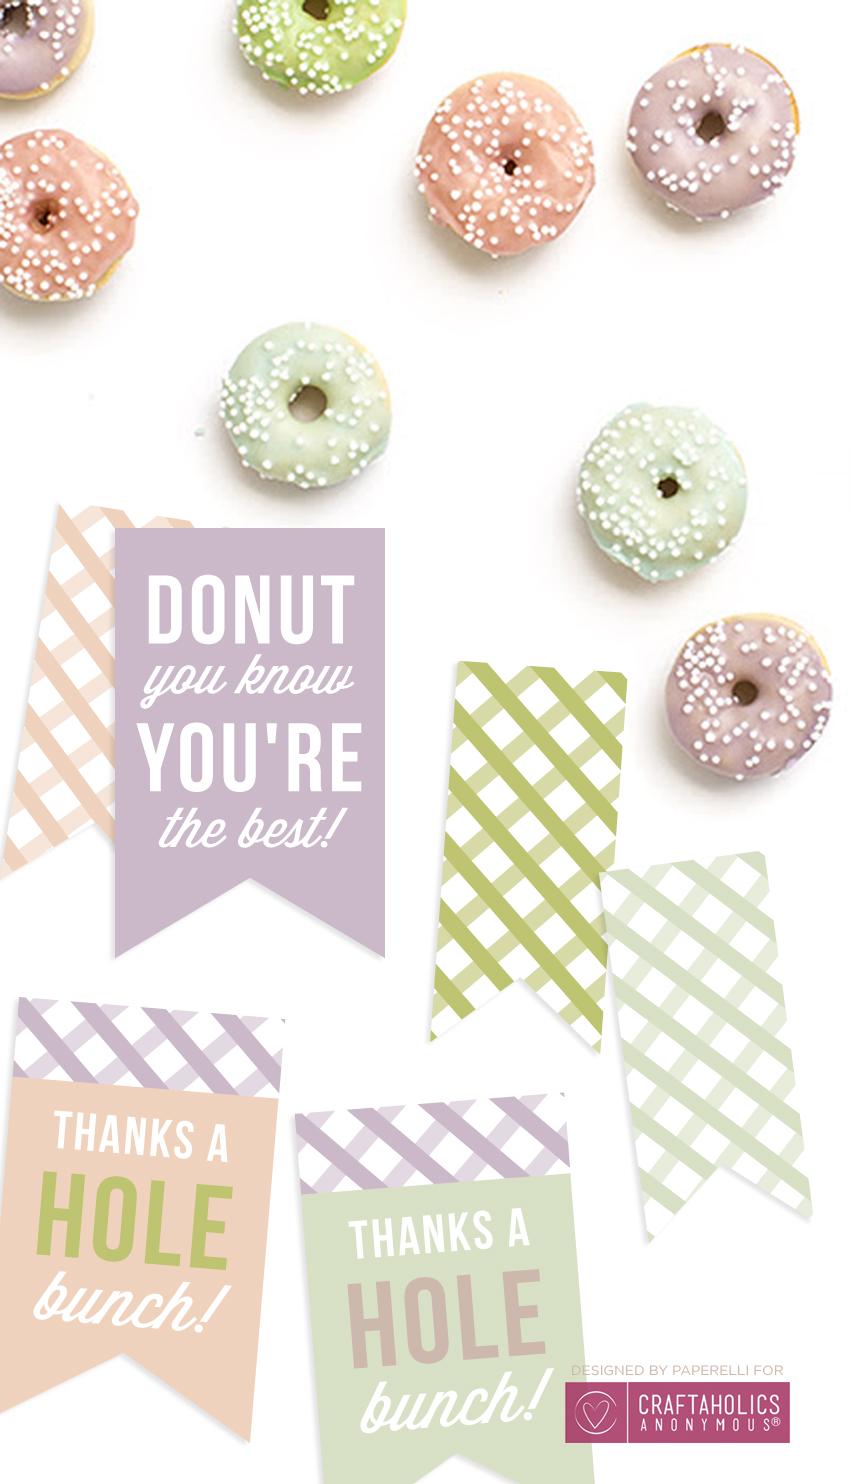 Free Printable Donut Tags @Craftaholics Anonymous